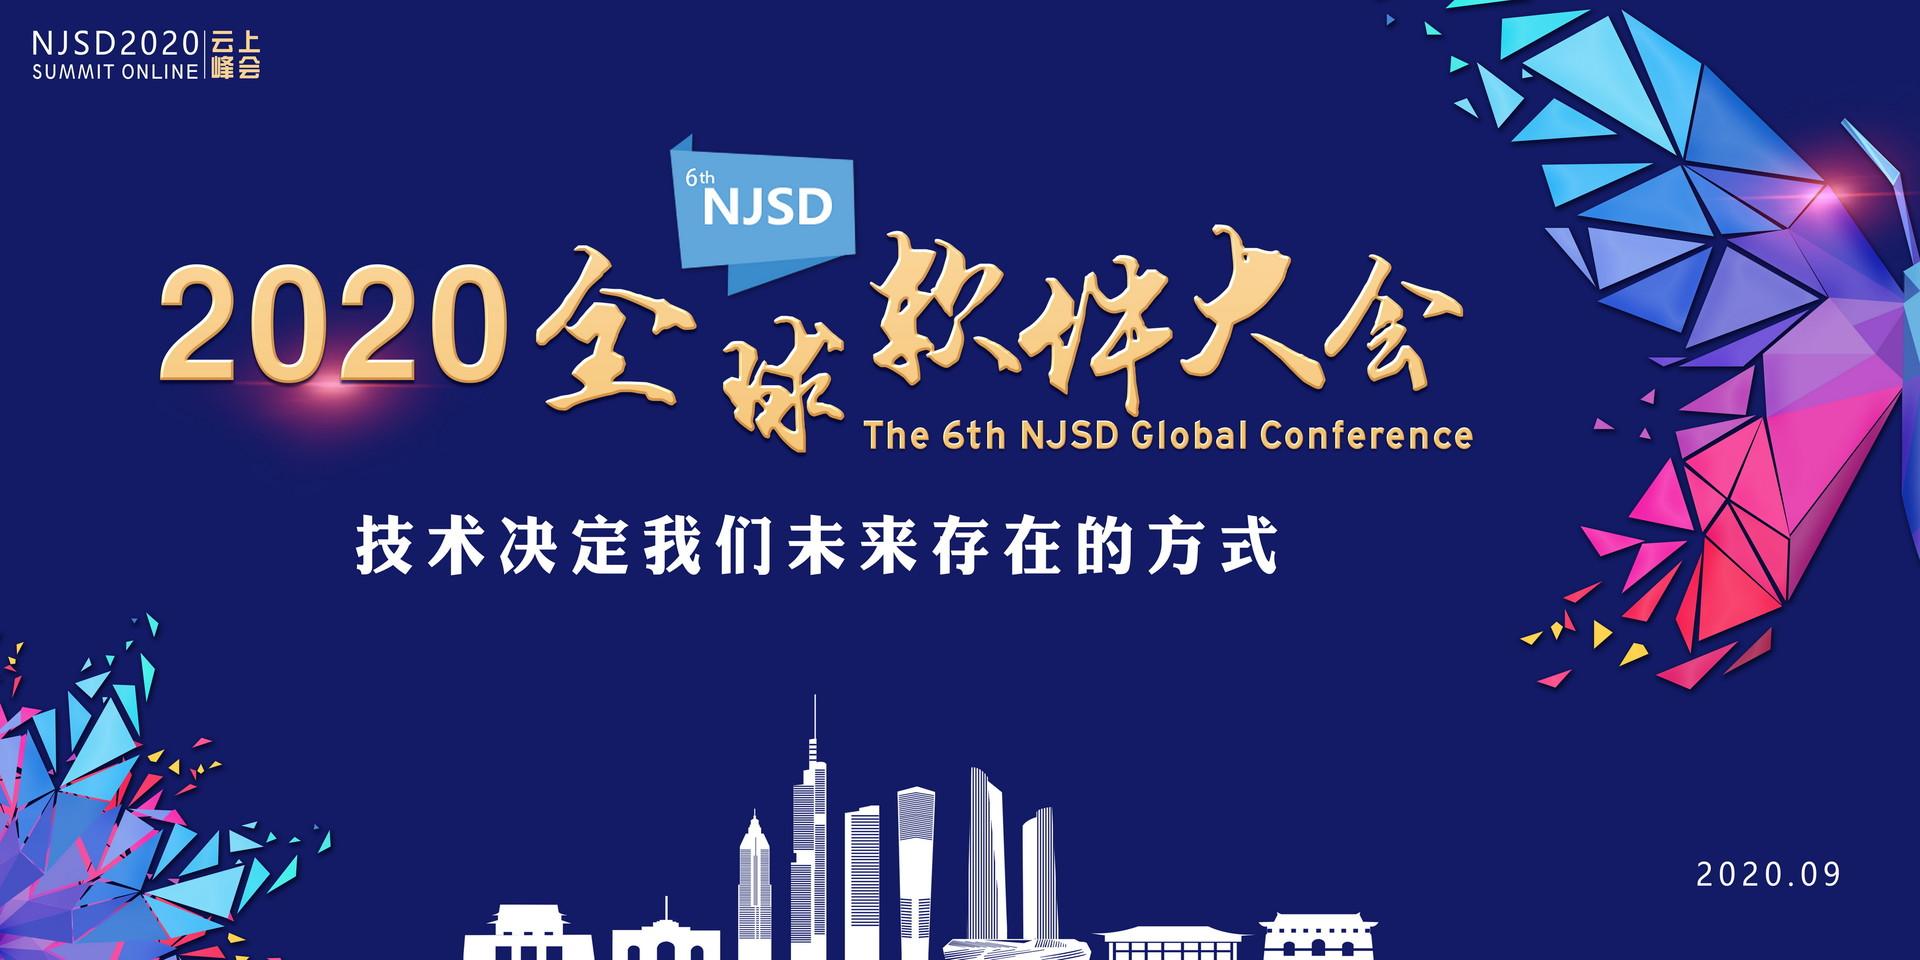 NJSD2020全球软件大会 | Summit Online